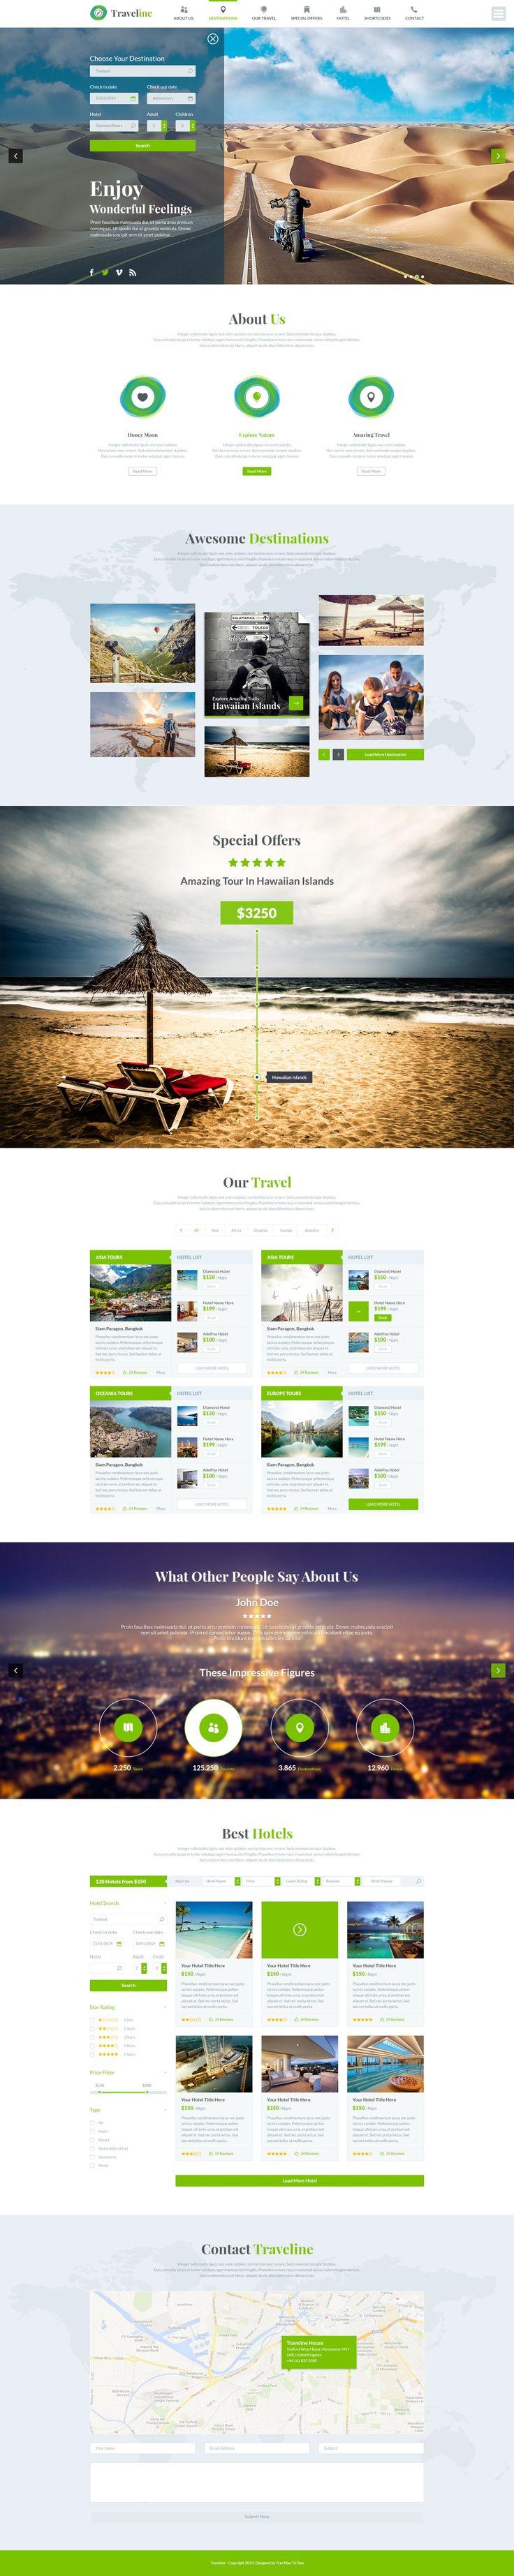 Traveline   Booking PSD Template. More info on http://themeforest.net/item/traveline-booking-psd-template/6501837?ref=ubaidullahbutt